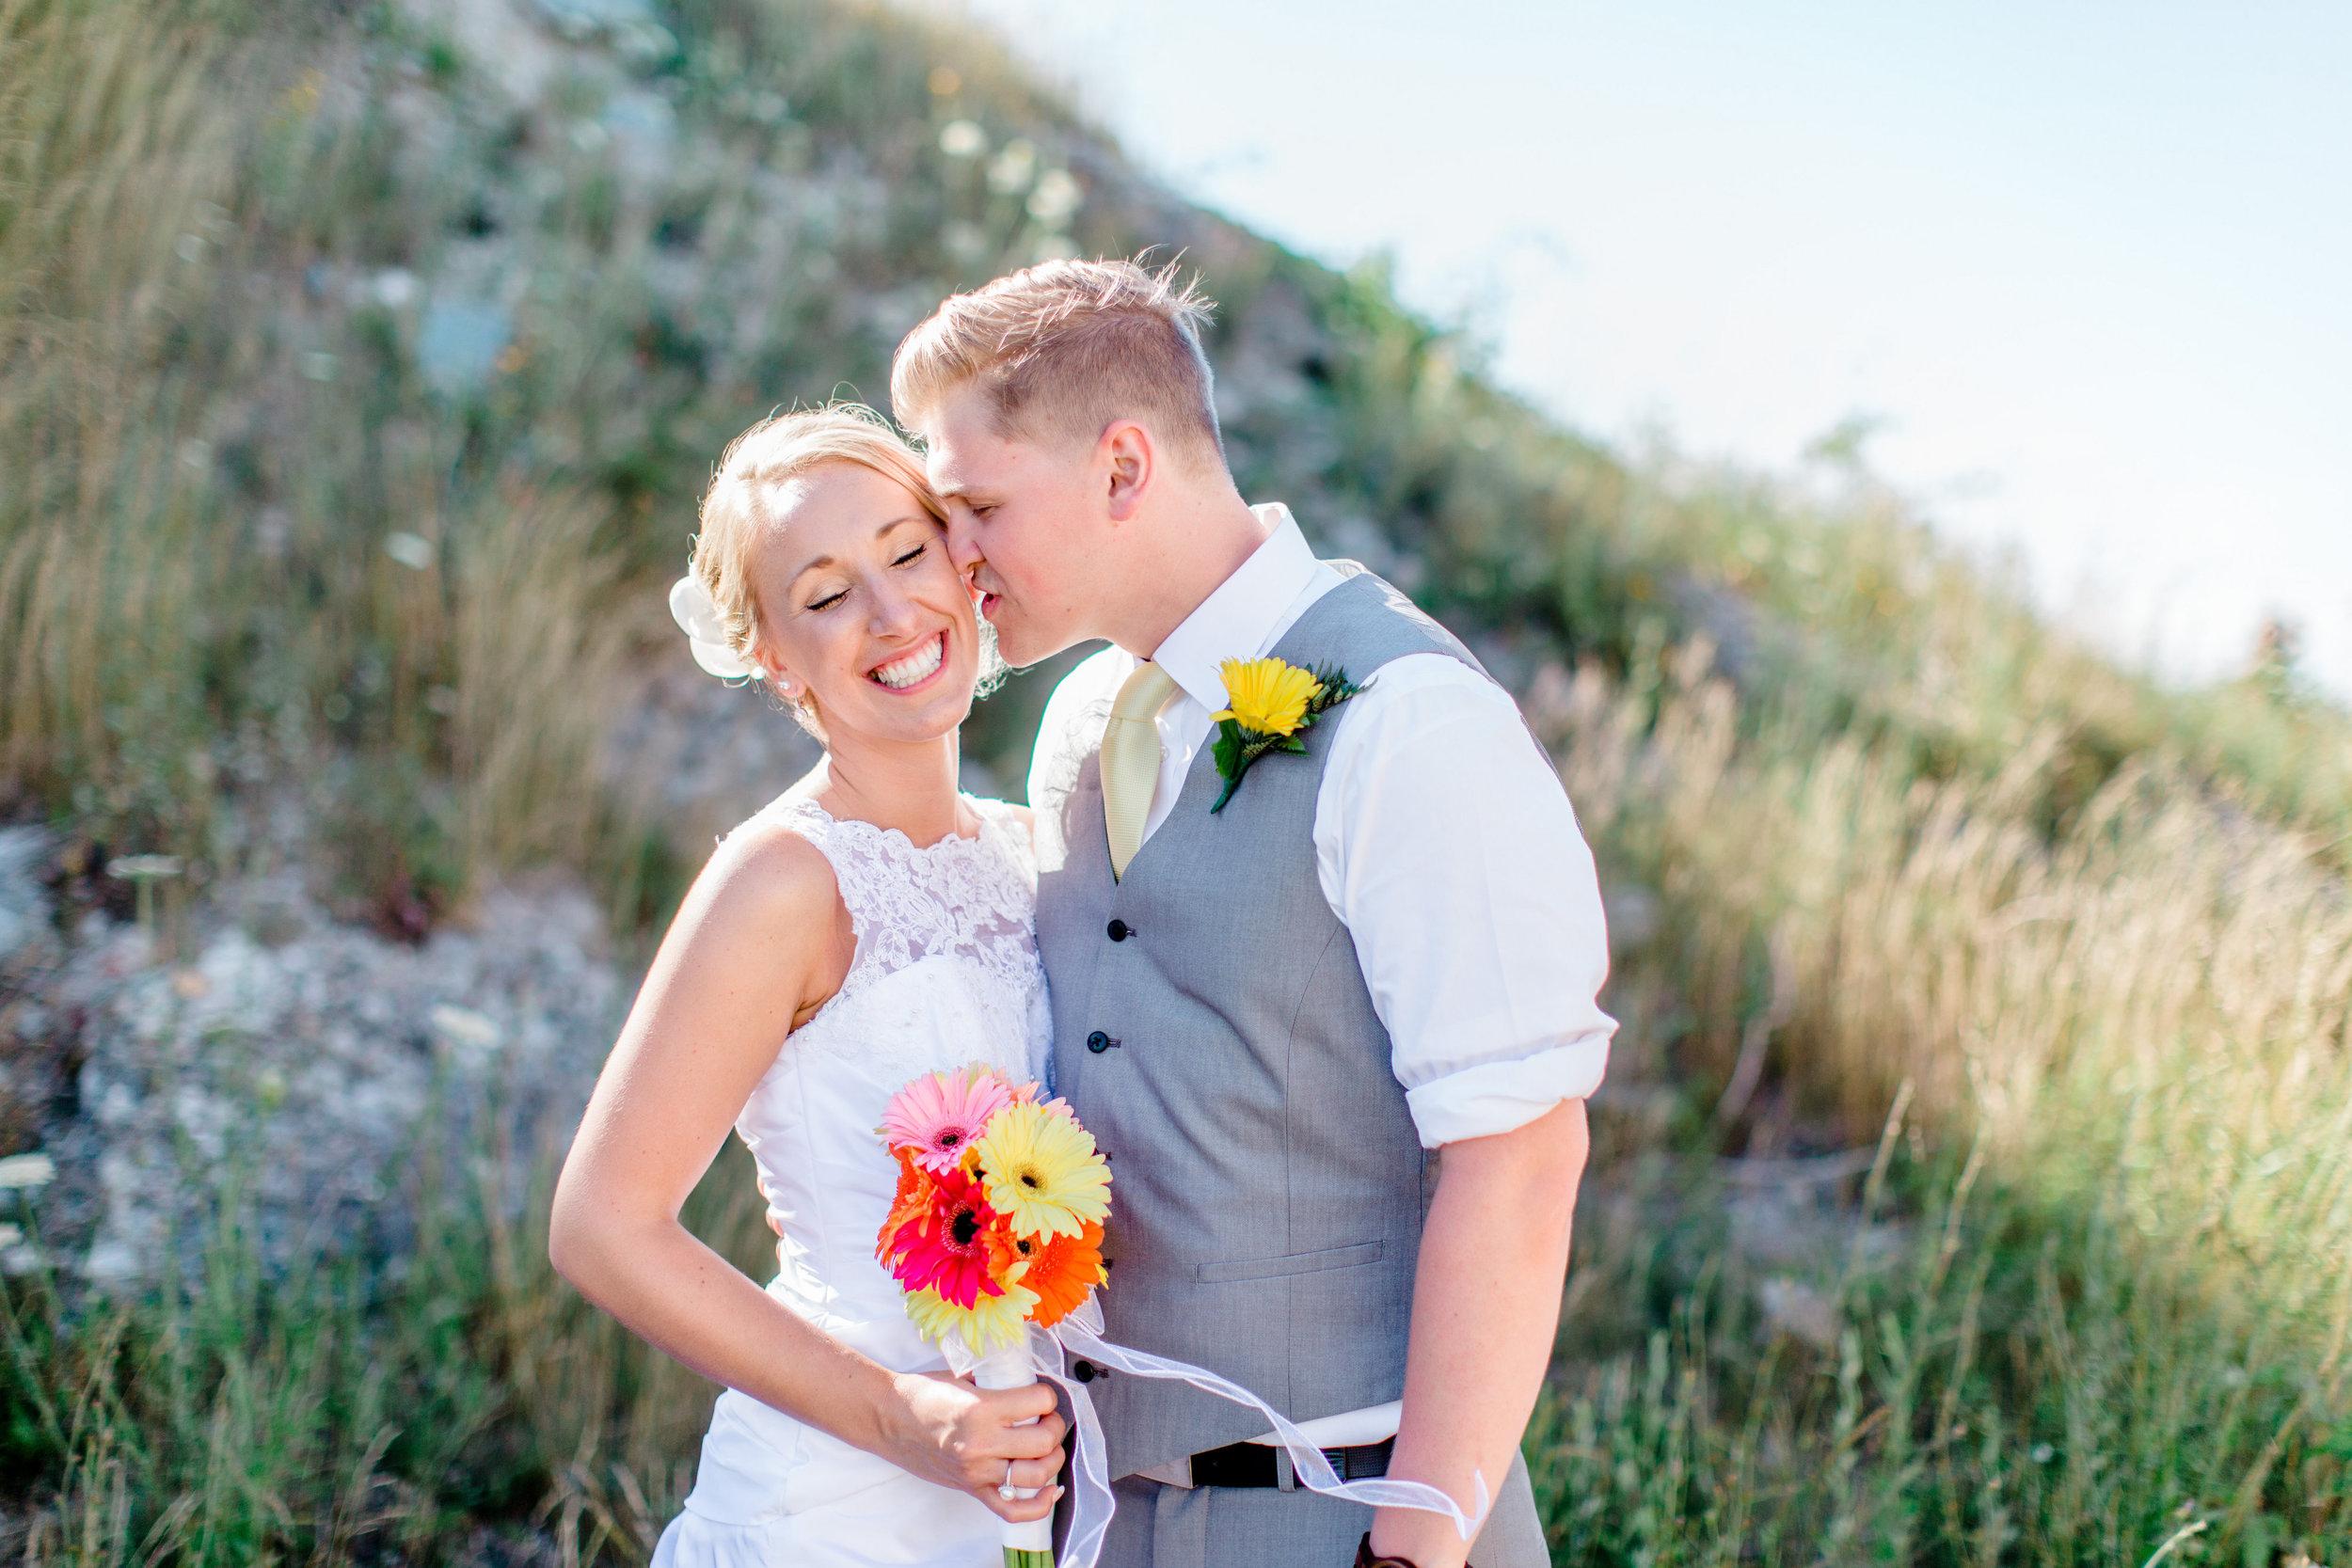 Bryndi Brad Wedding-6family bridal party photos-0181.jpg